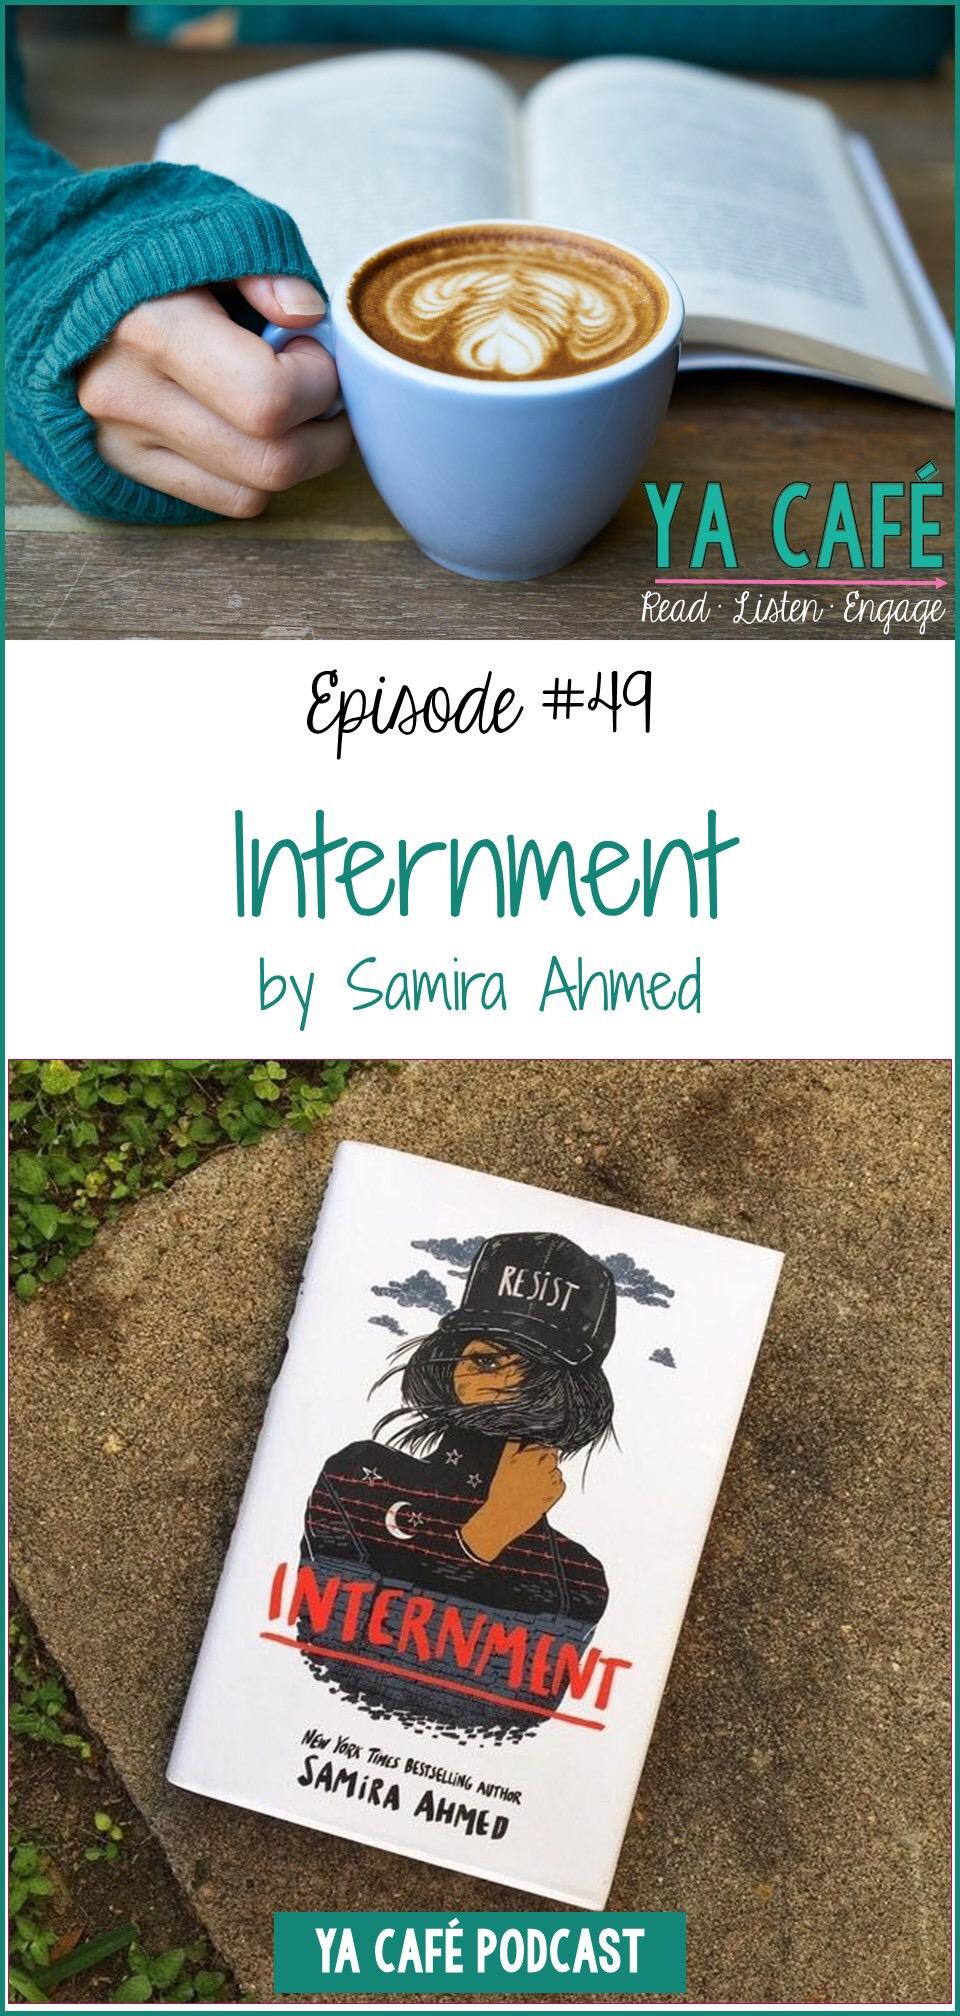 49 Internment by Samira Ahmed